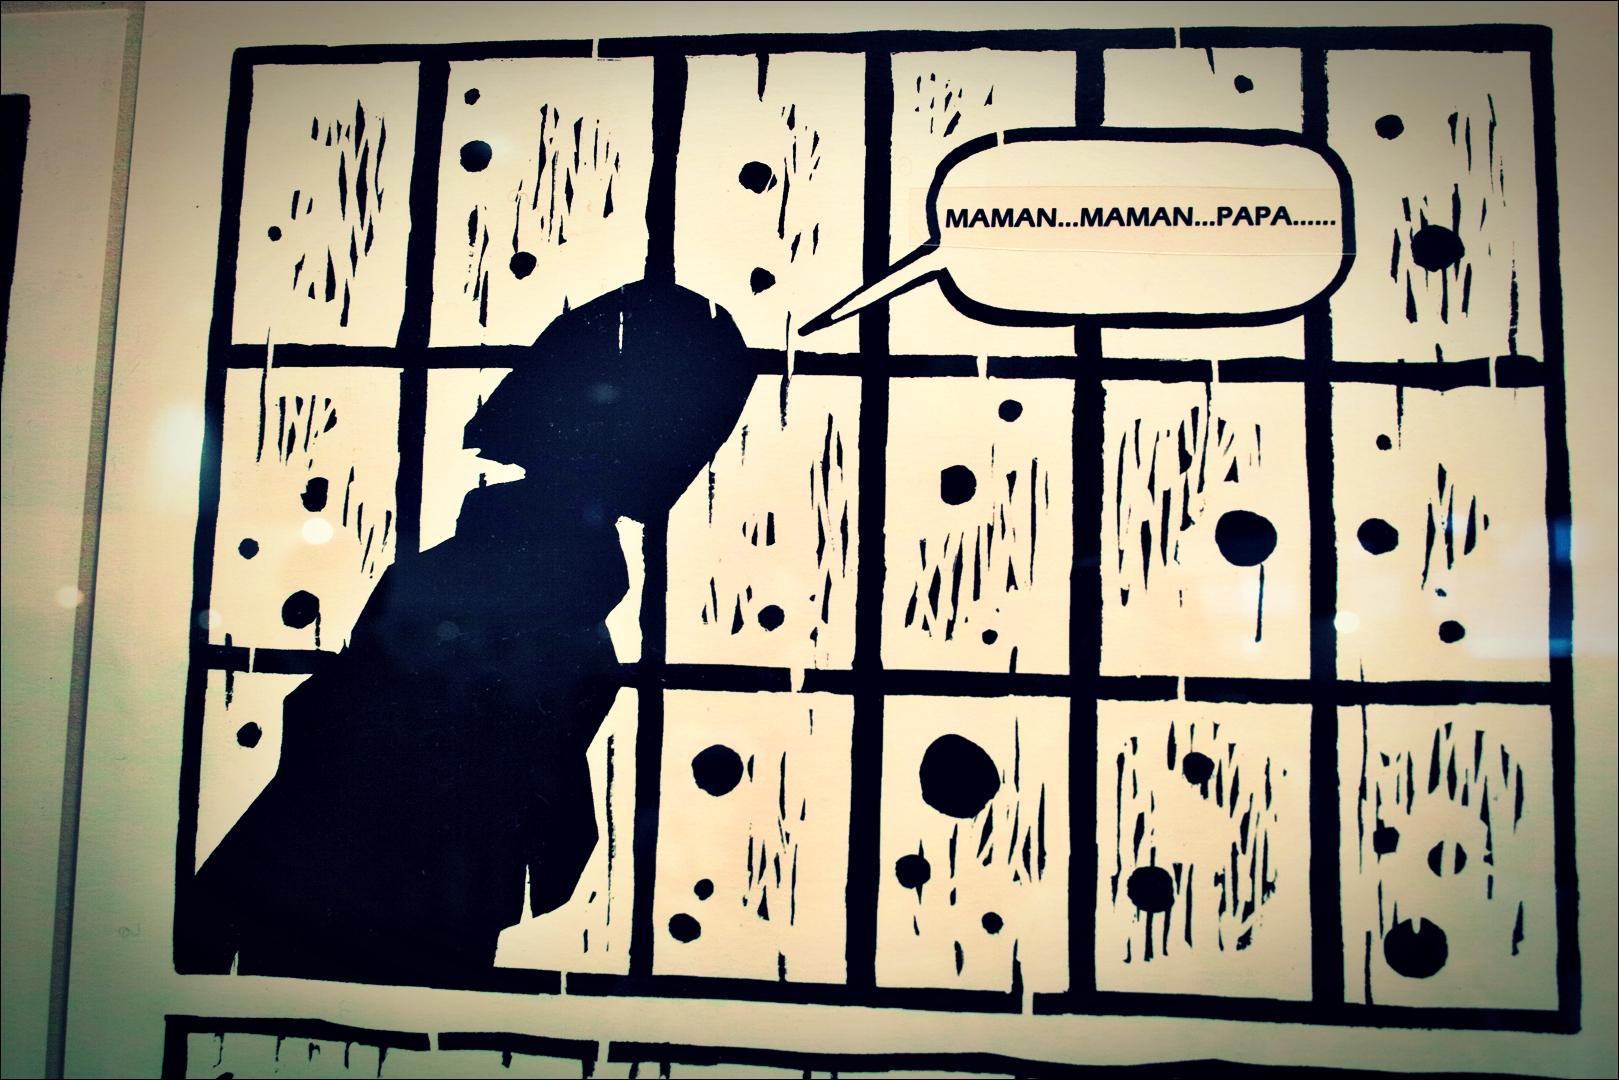 Maman-'지지 않는 꽃 Cartoons of The Japanese Military Sexual Slavery'